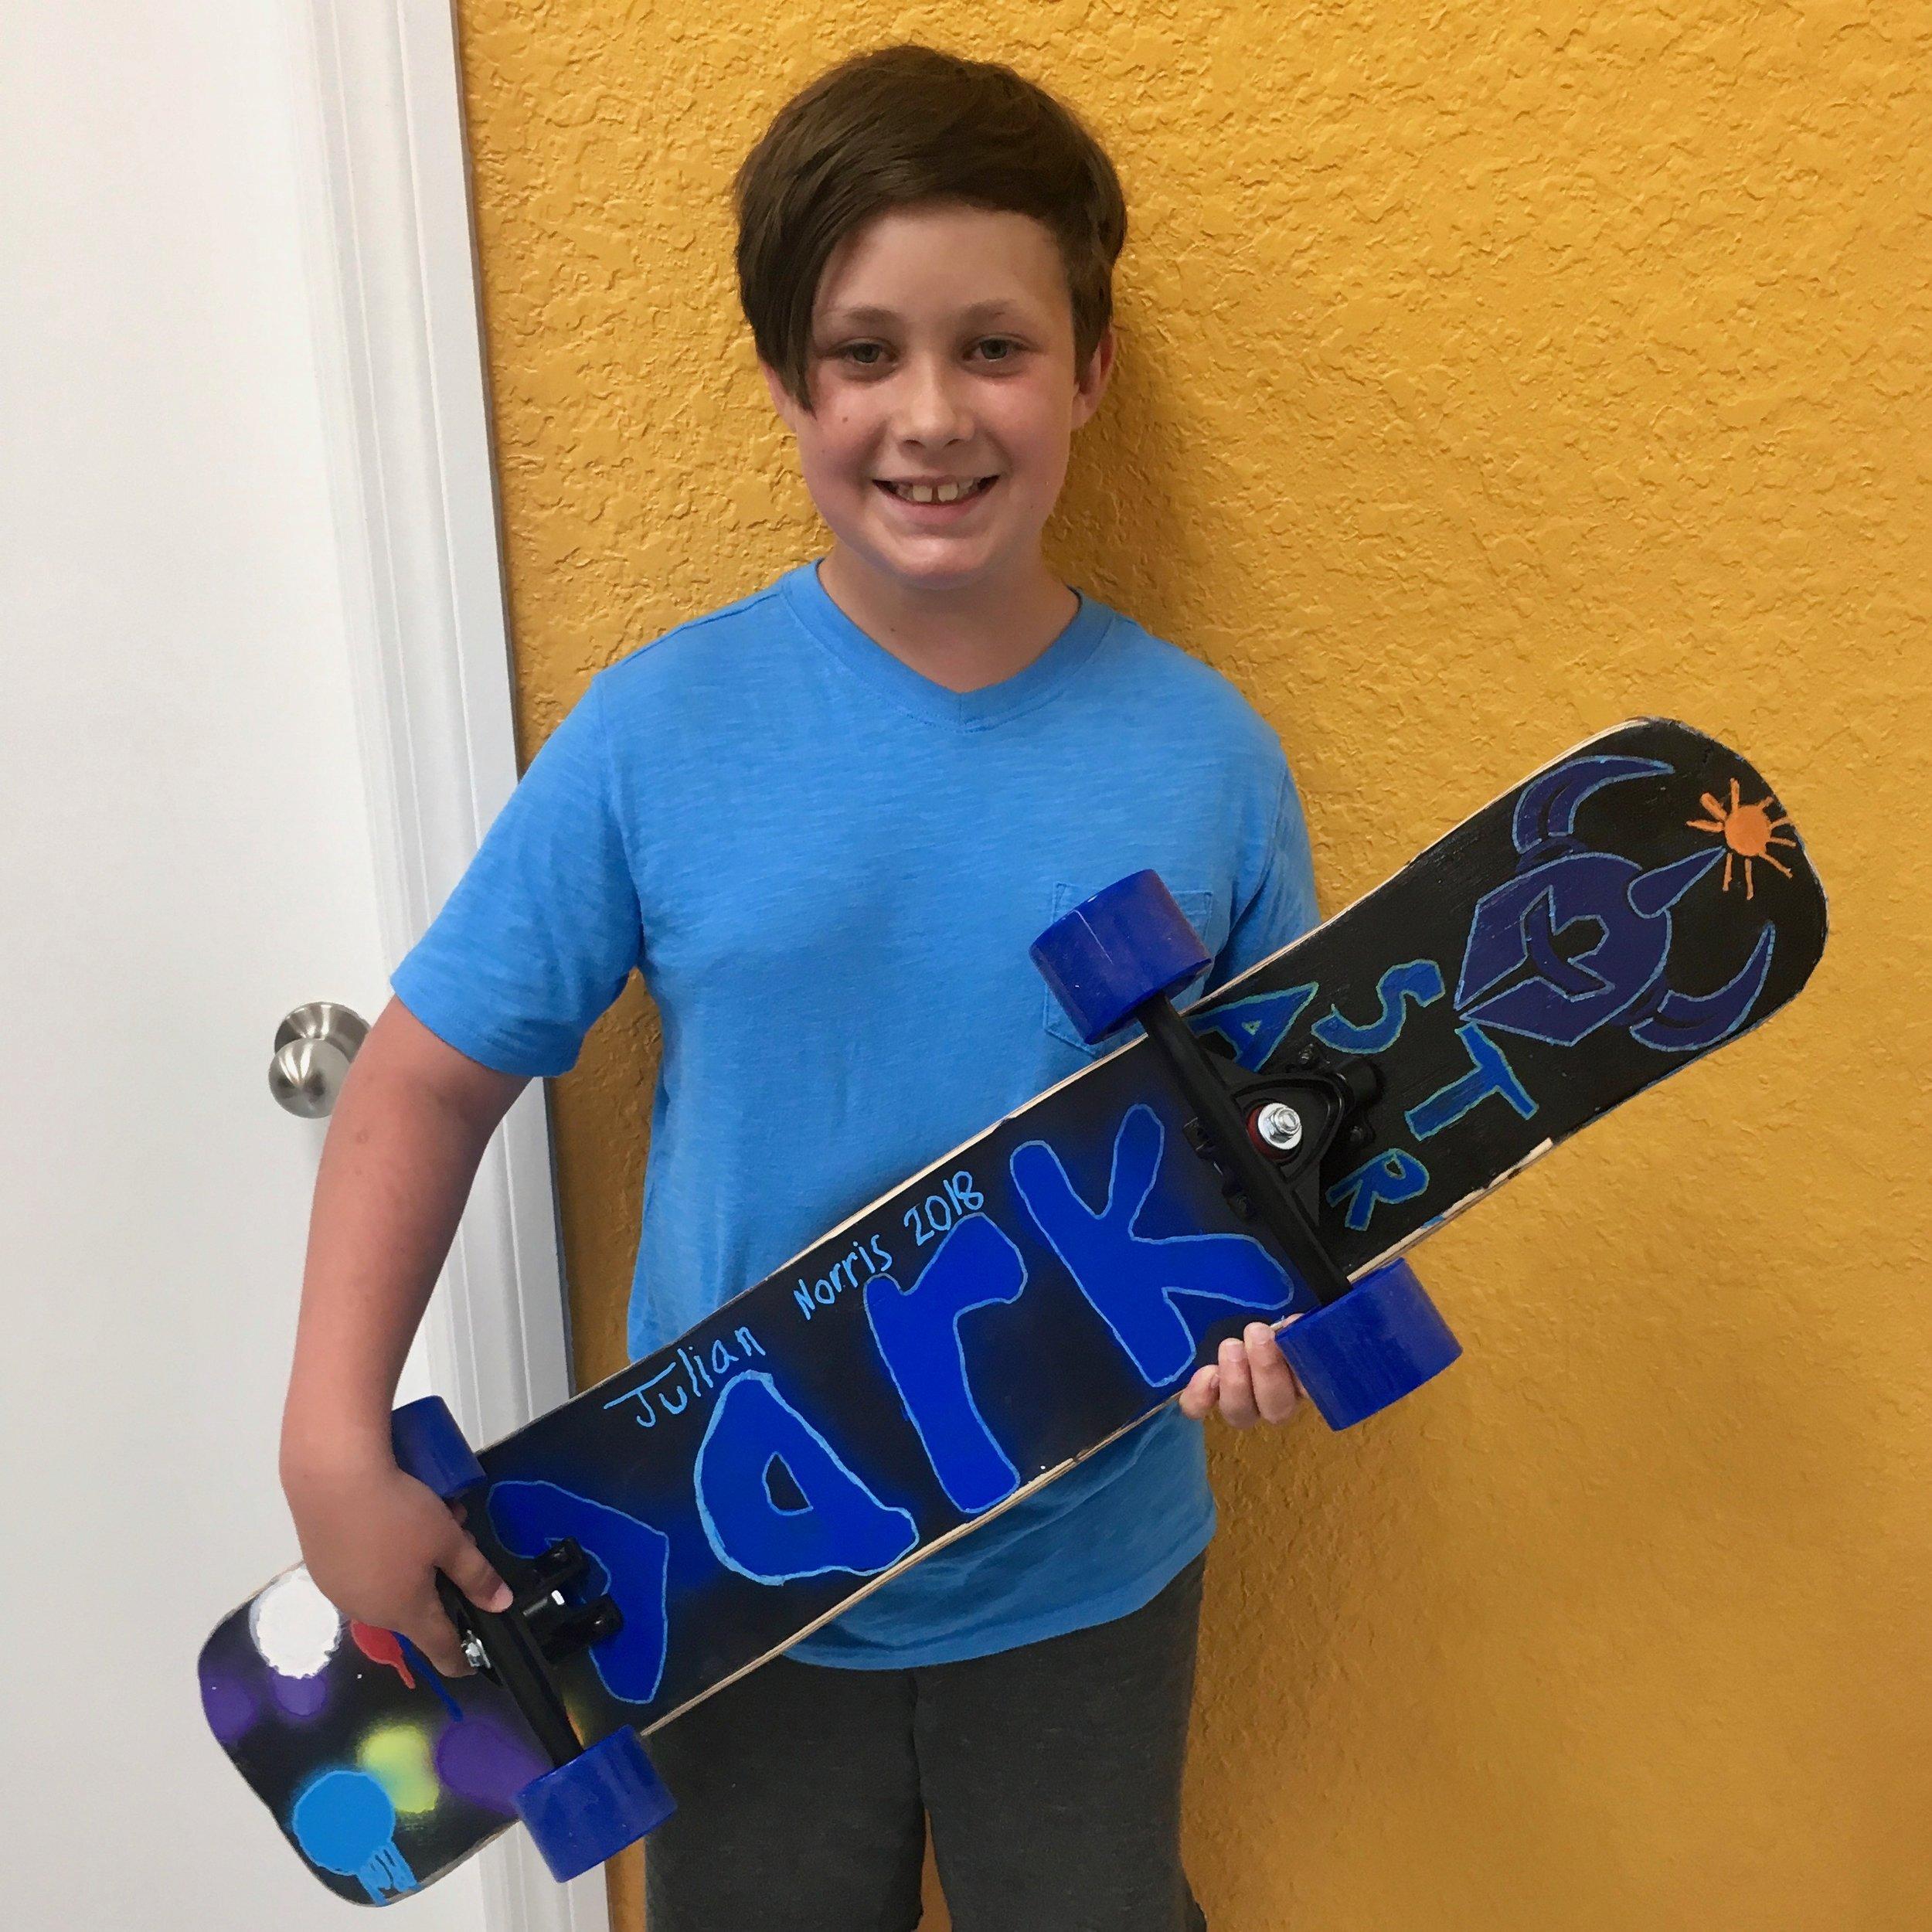 DIY Skateboards - BEST - 15 of 36.jpg